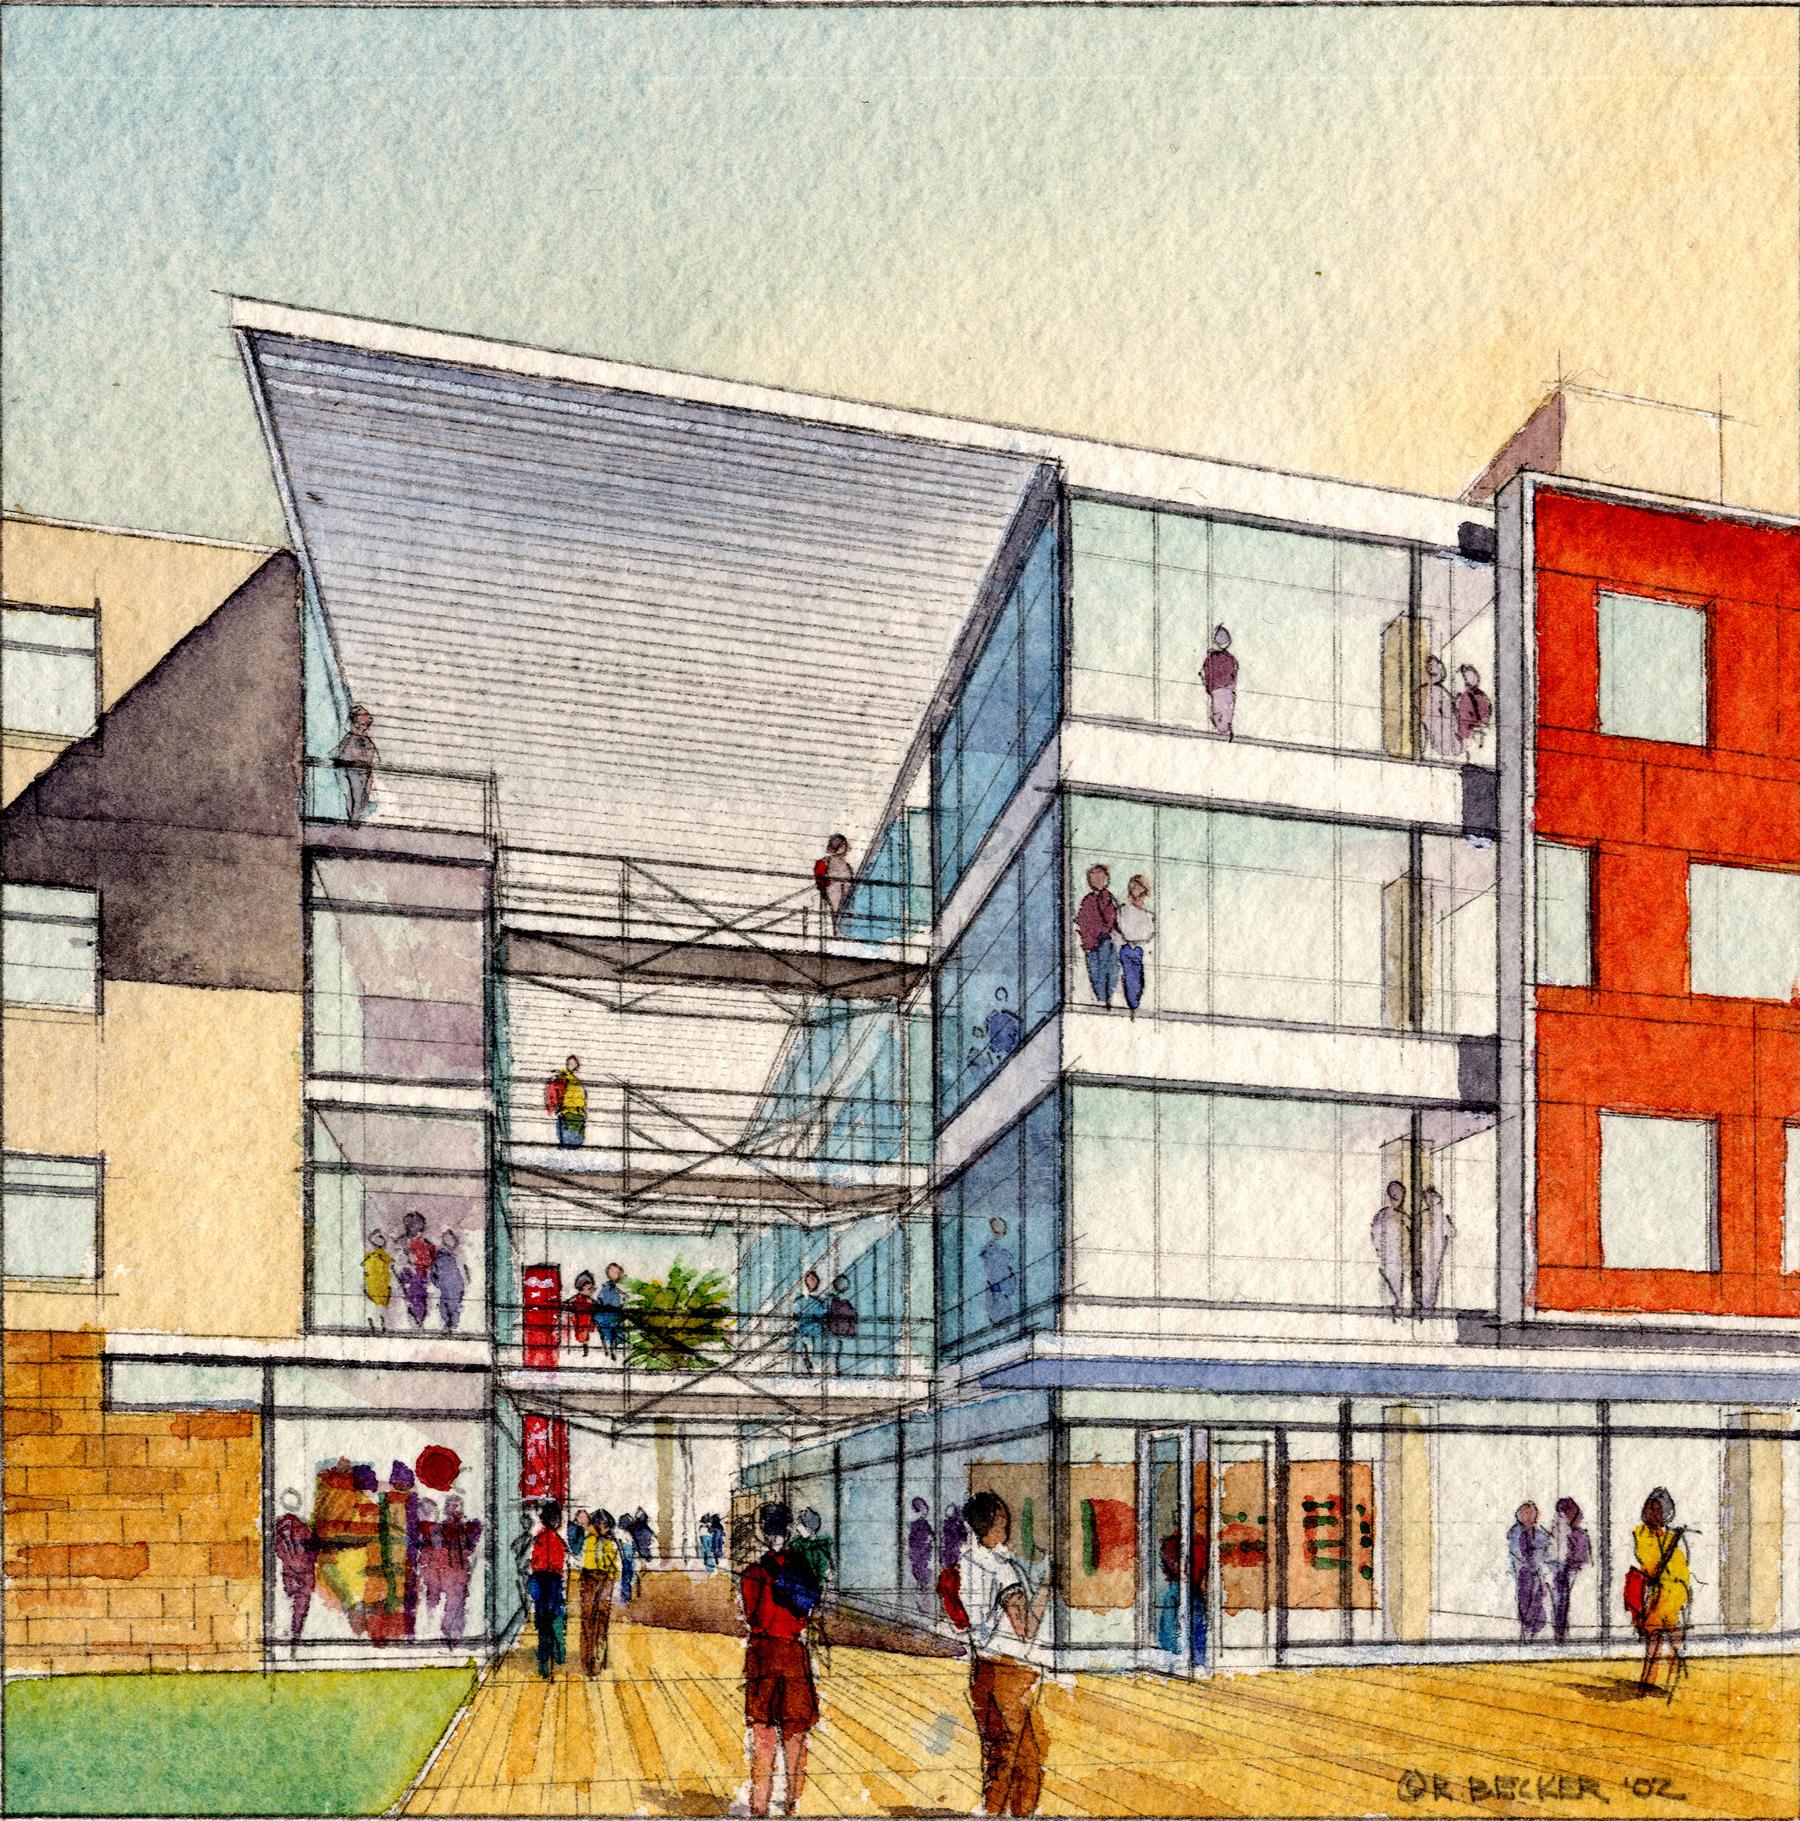 GHCP UCSD Entry watercolor sketch